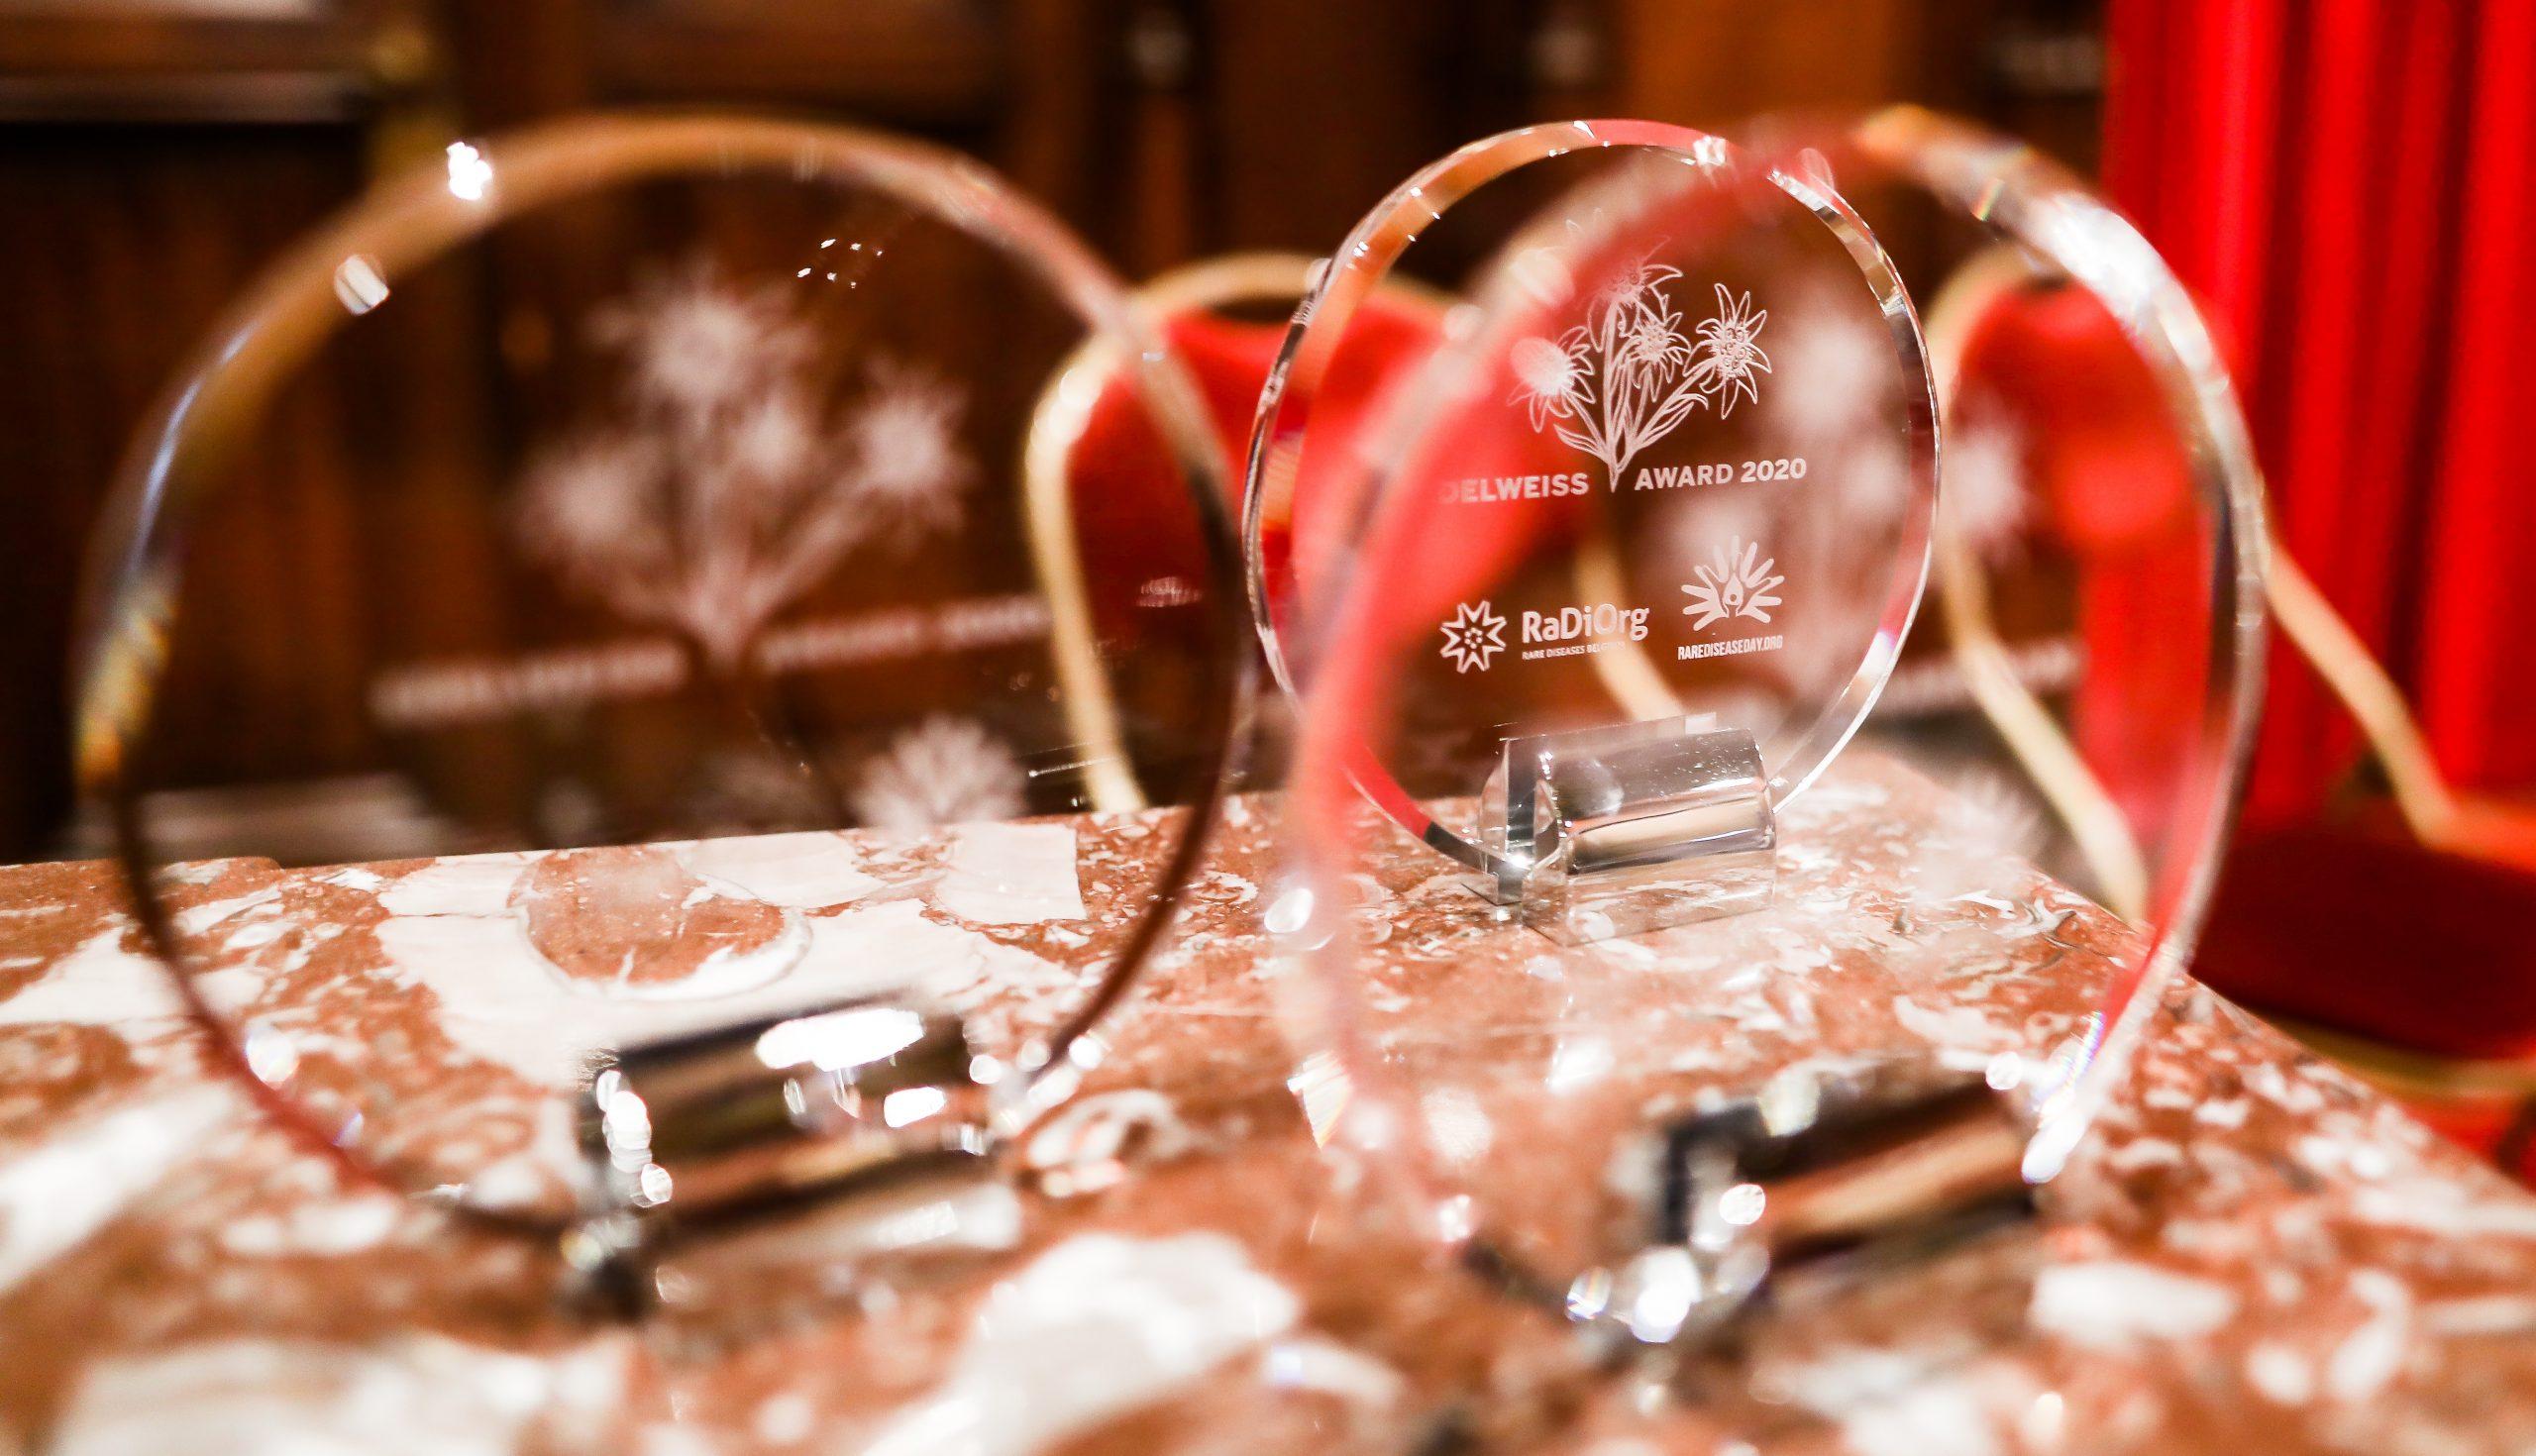 Edelweiss Awards